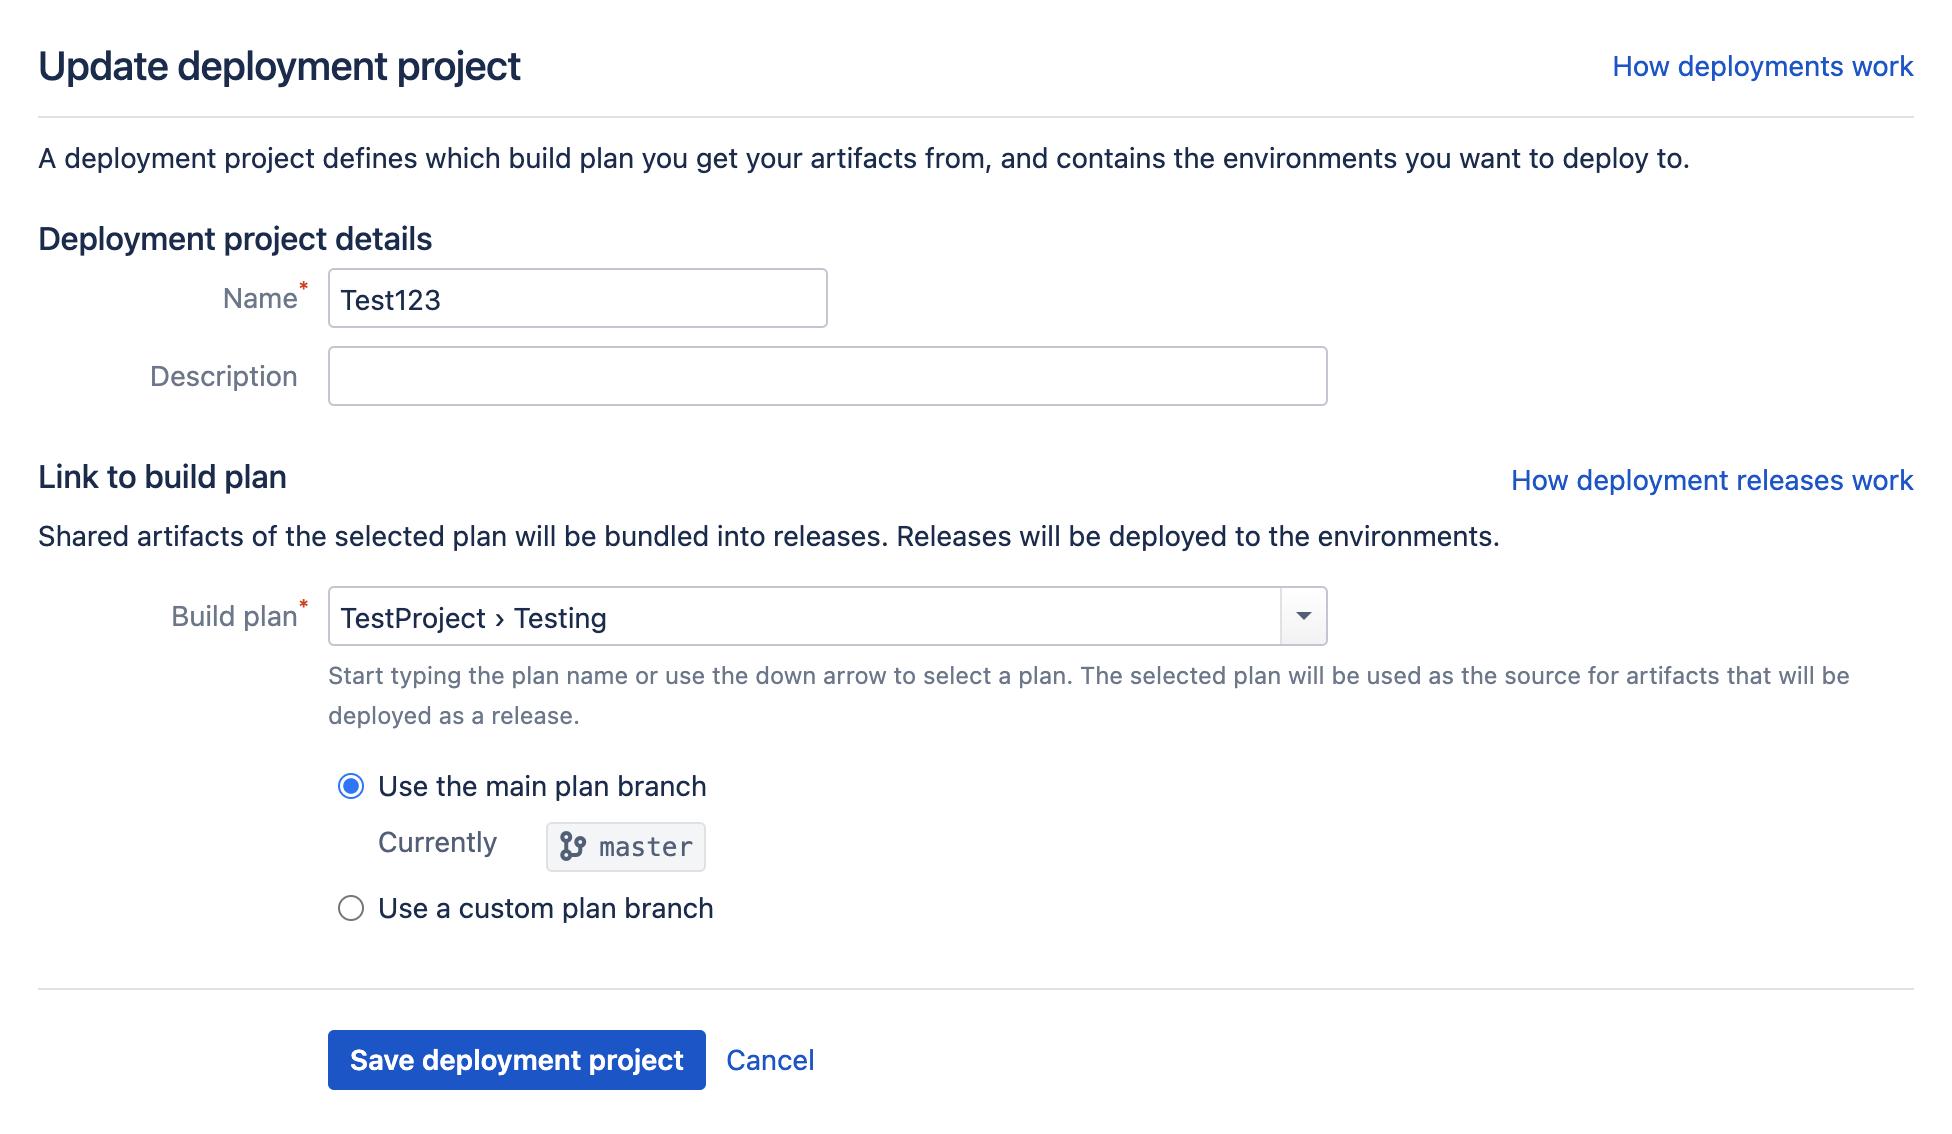 Update deployment project screen